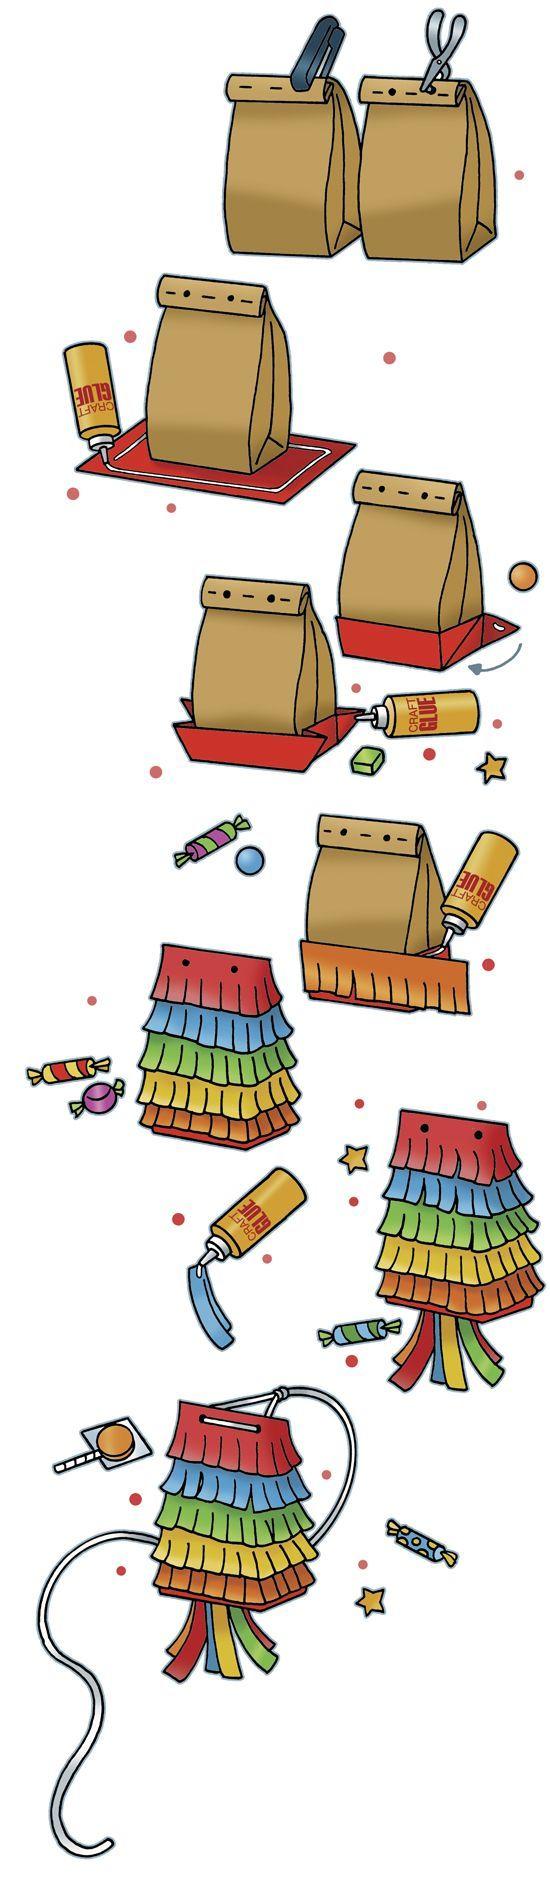 Мешочница для пакетов своими руками фото 328